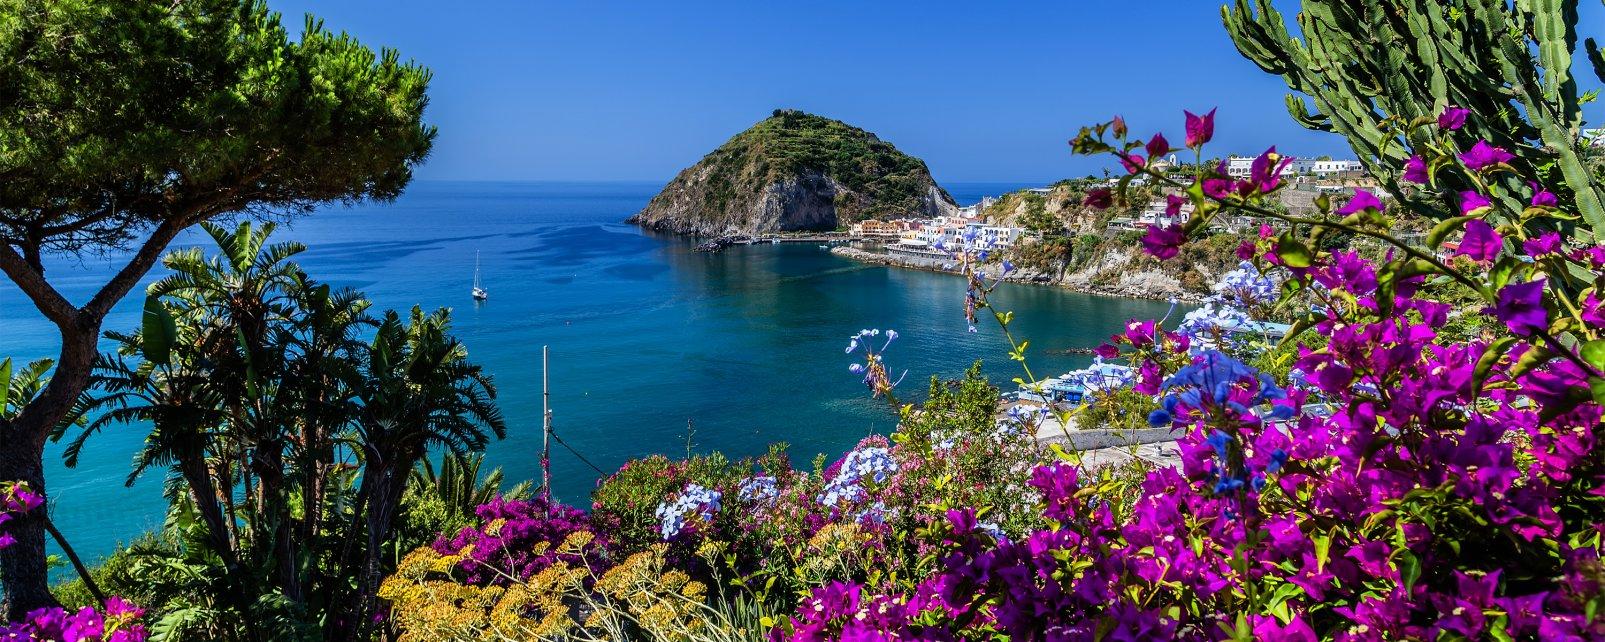 Ischia, Campanie, Italie,